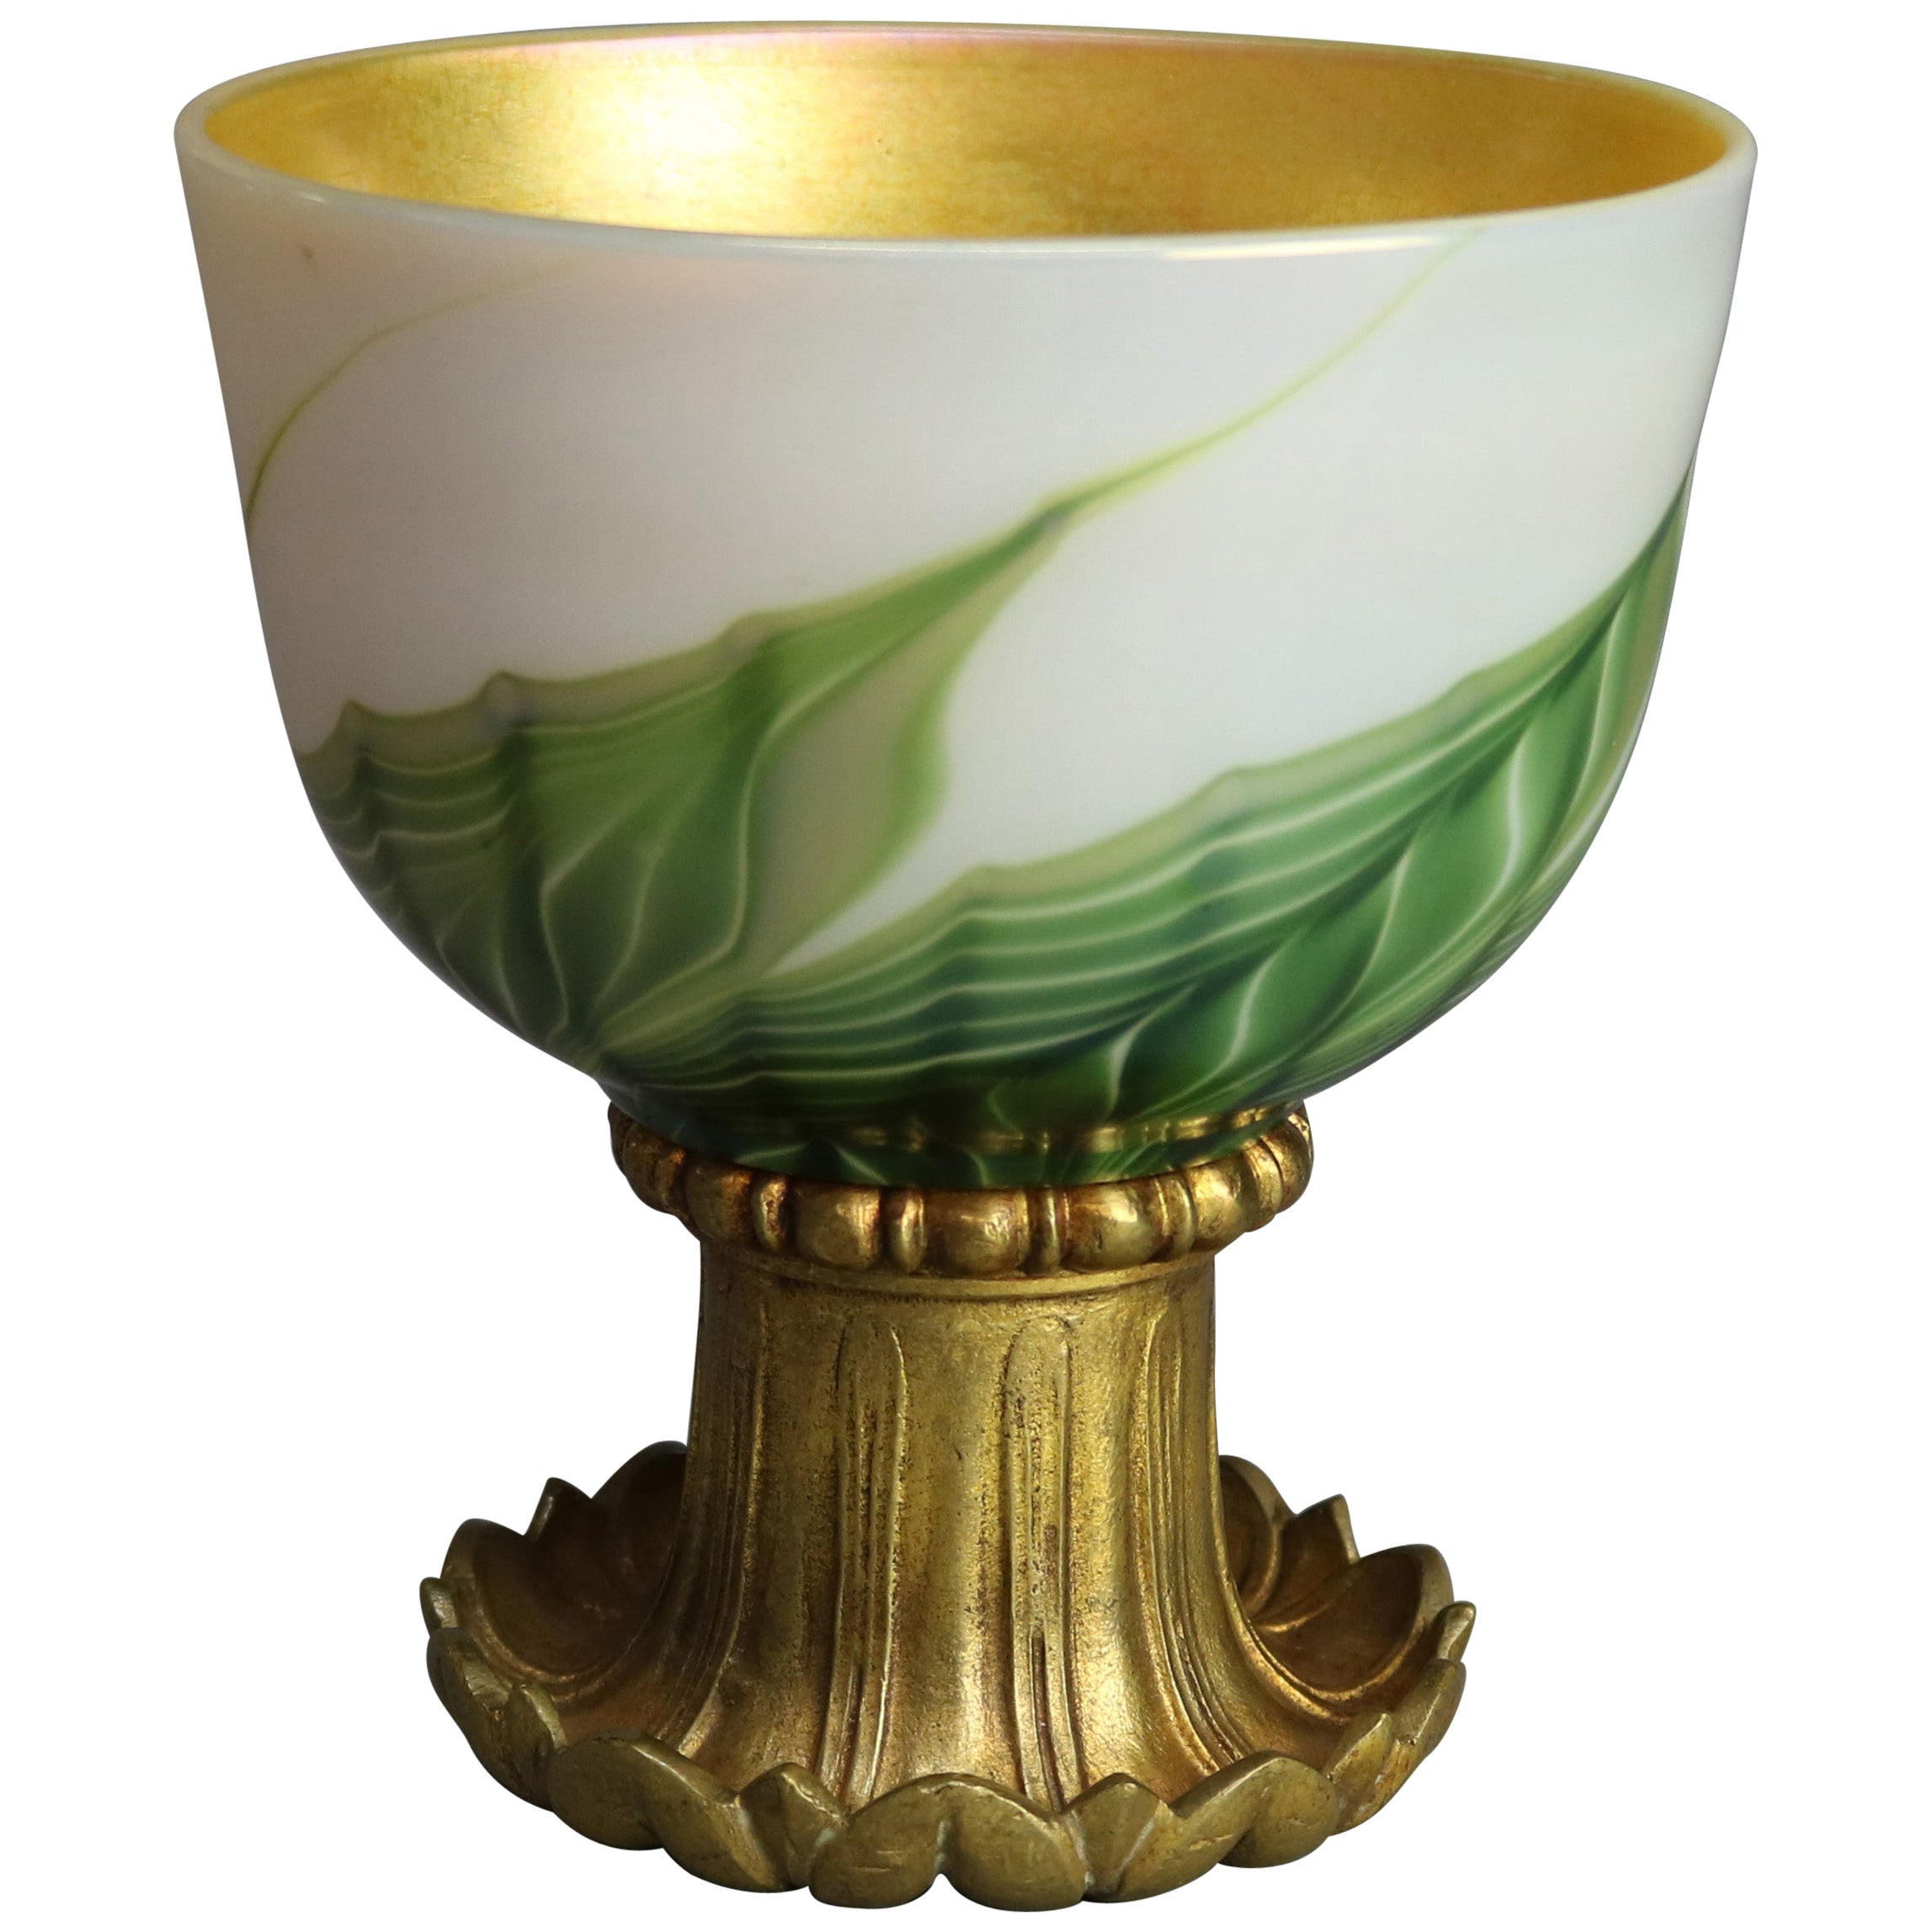 Tiffany Studio Favrile Pulled Feather Art Glass & Gilt Bronze Chalice circa 1890